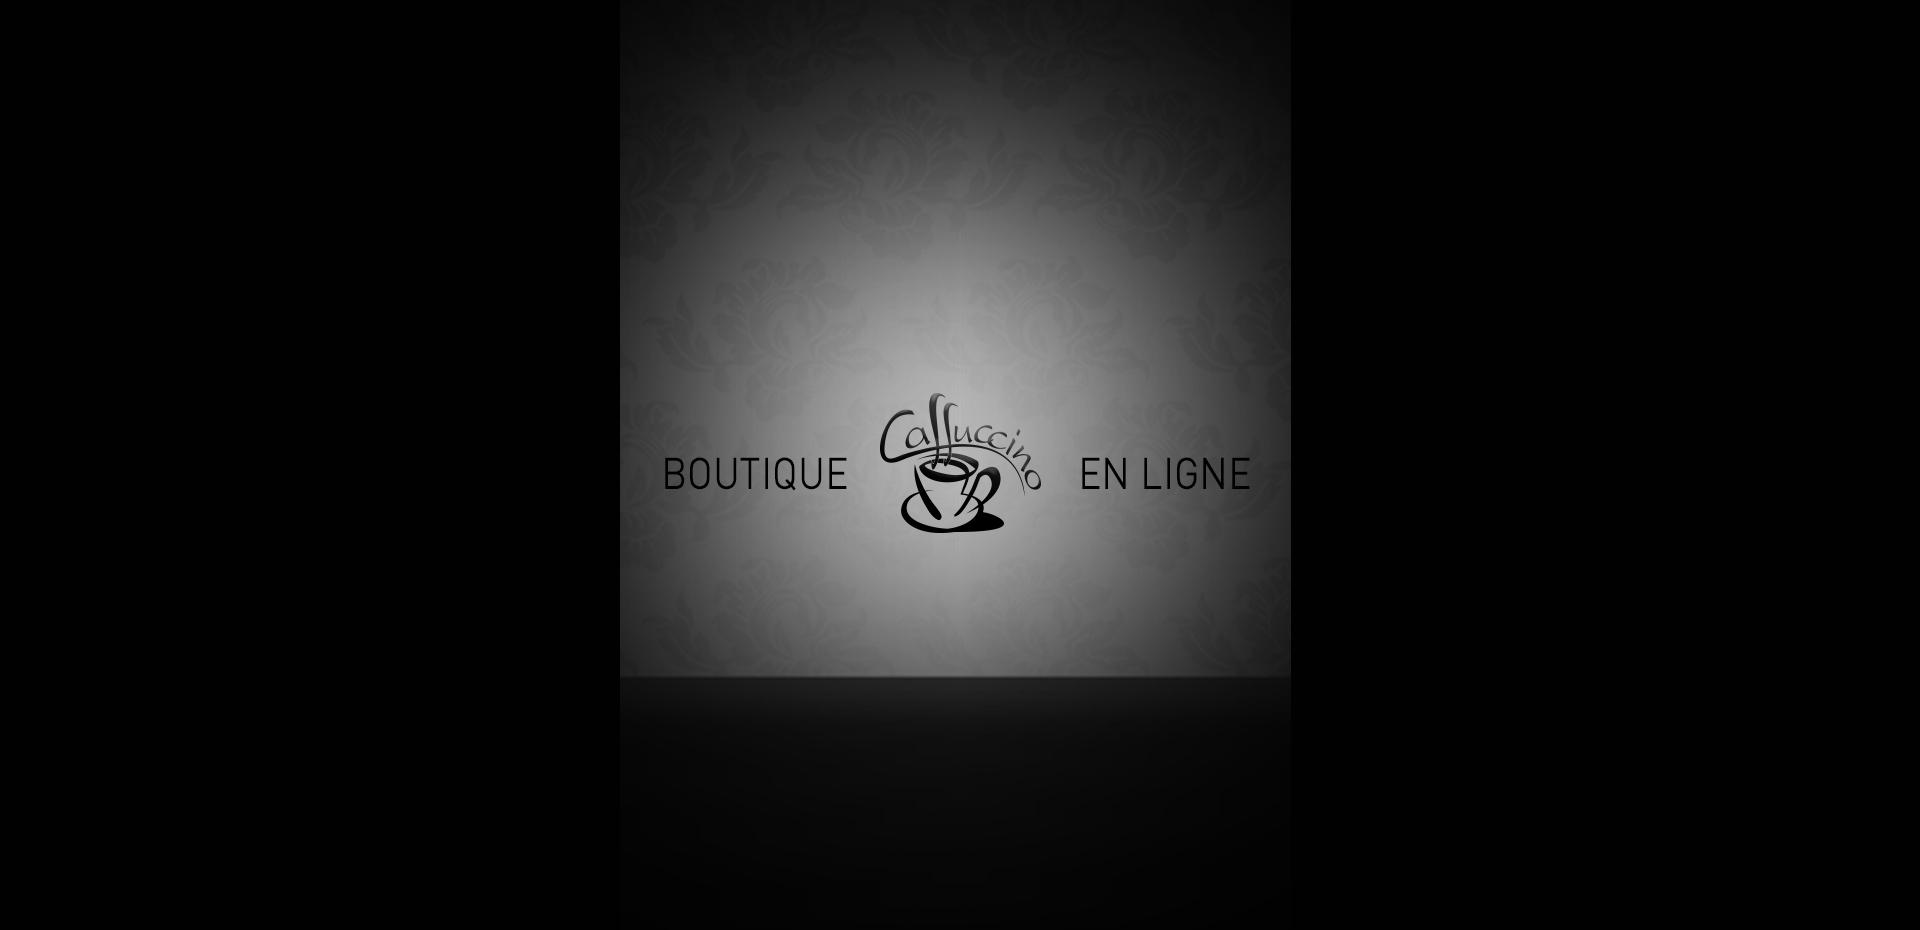 Caffuccino - Boutique en ligne